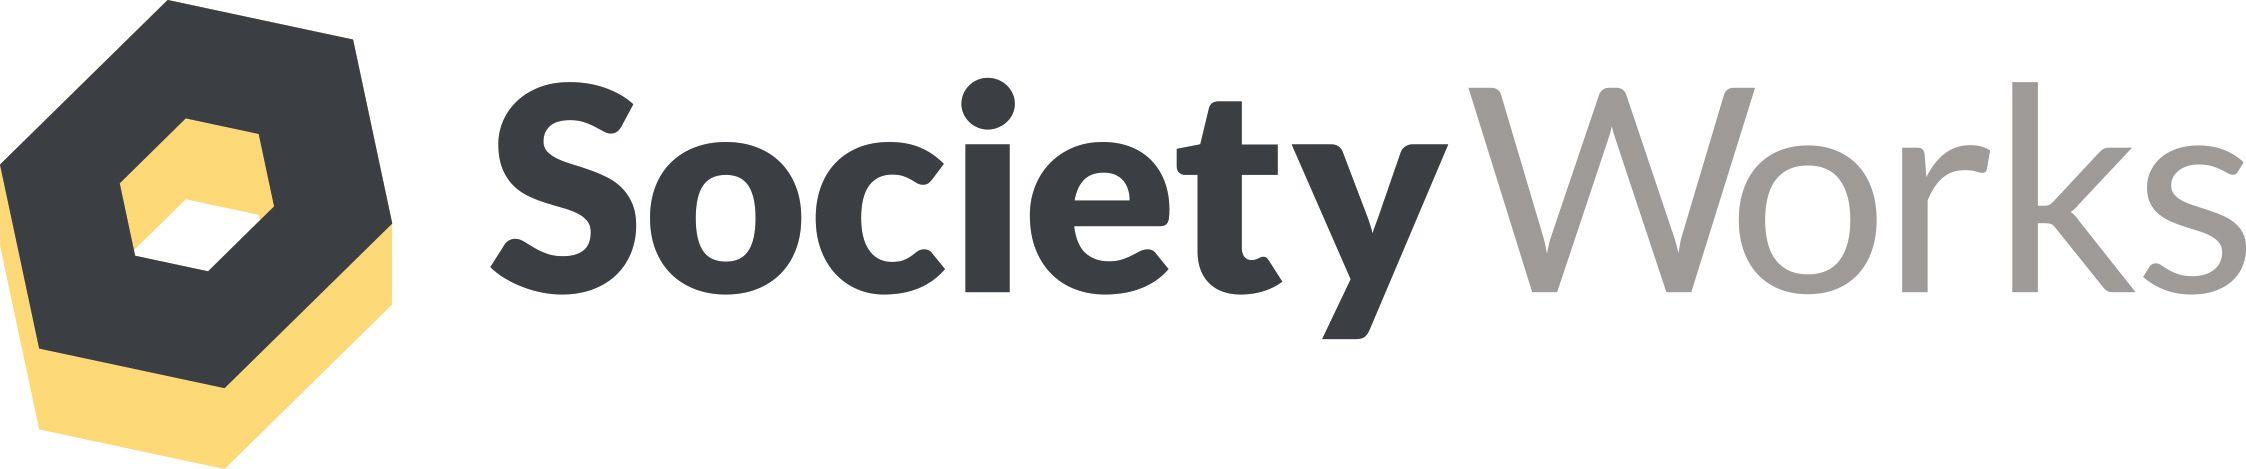 SocietyWorks